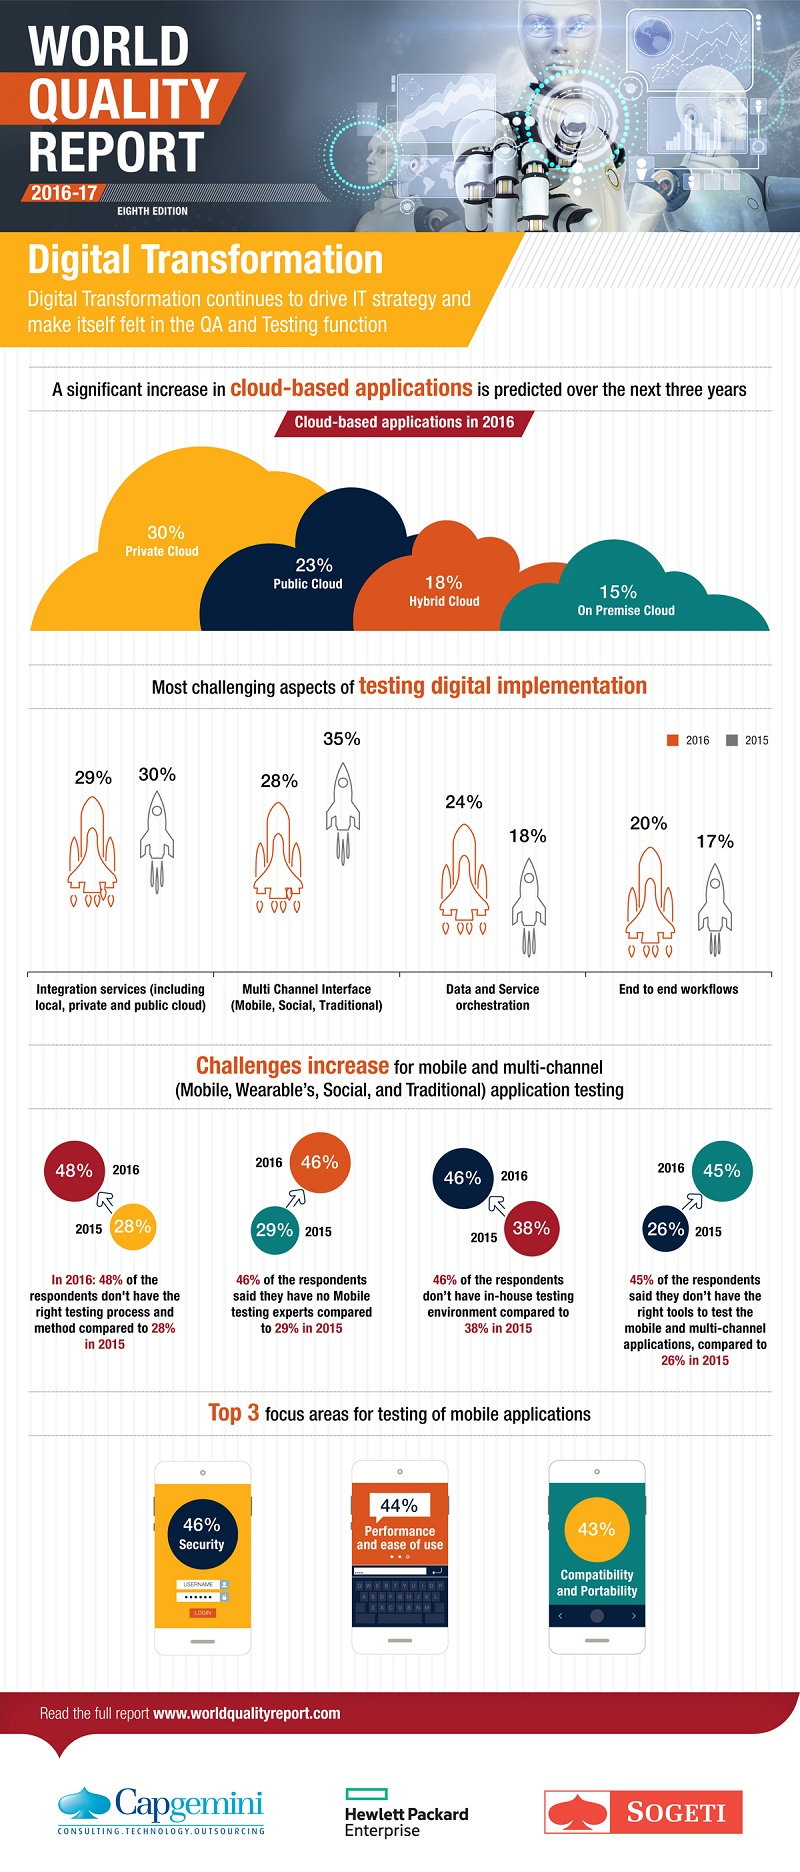 World Quality Report - Digital Transformation infographic